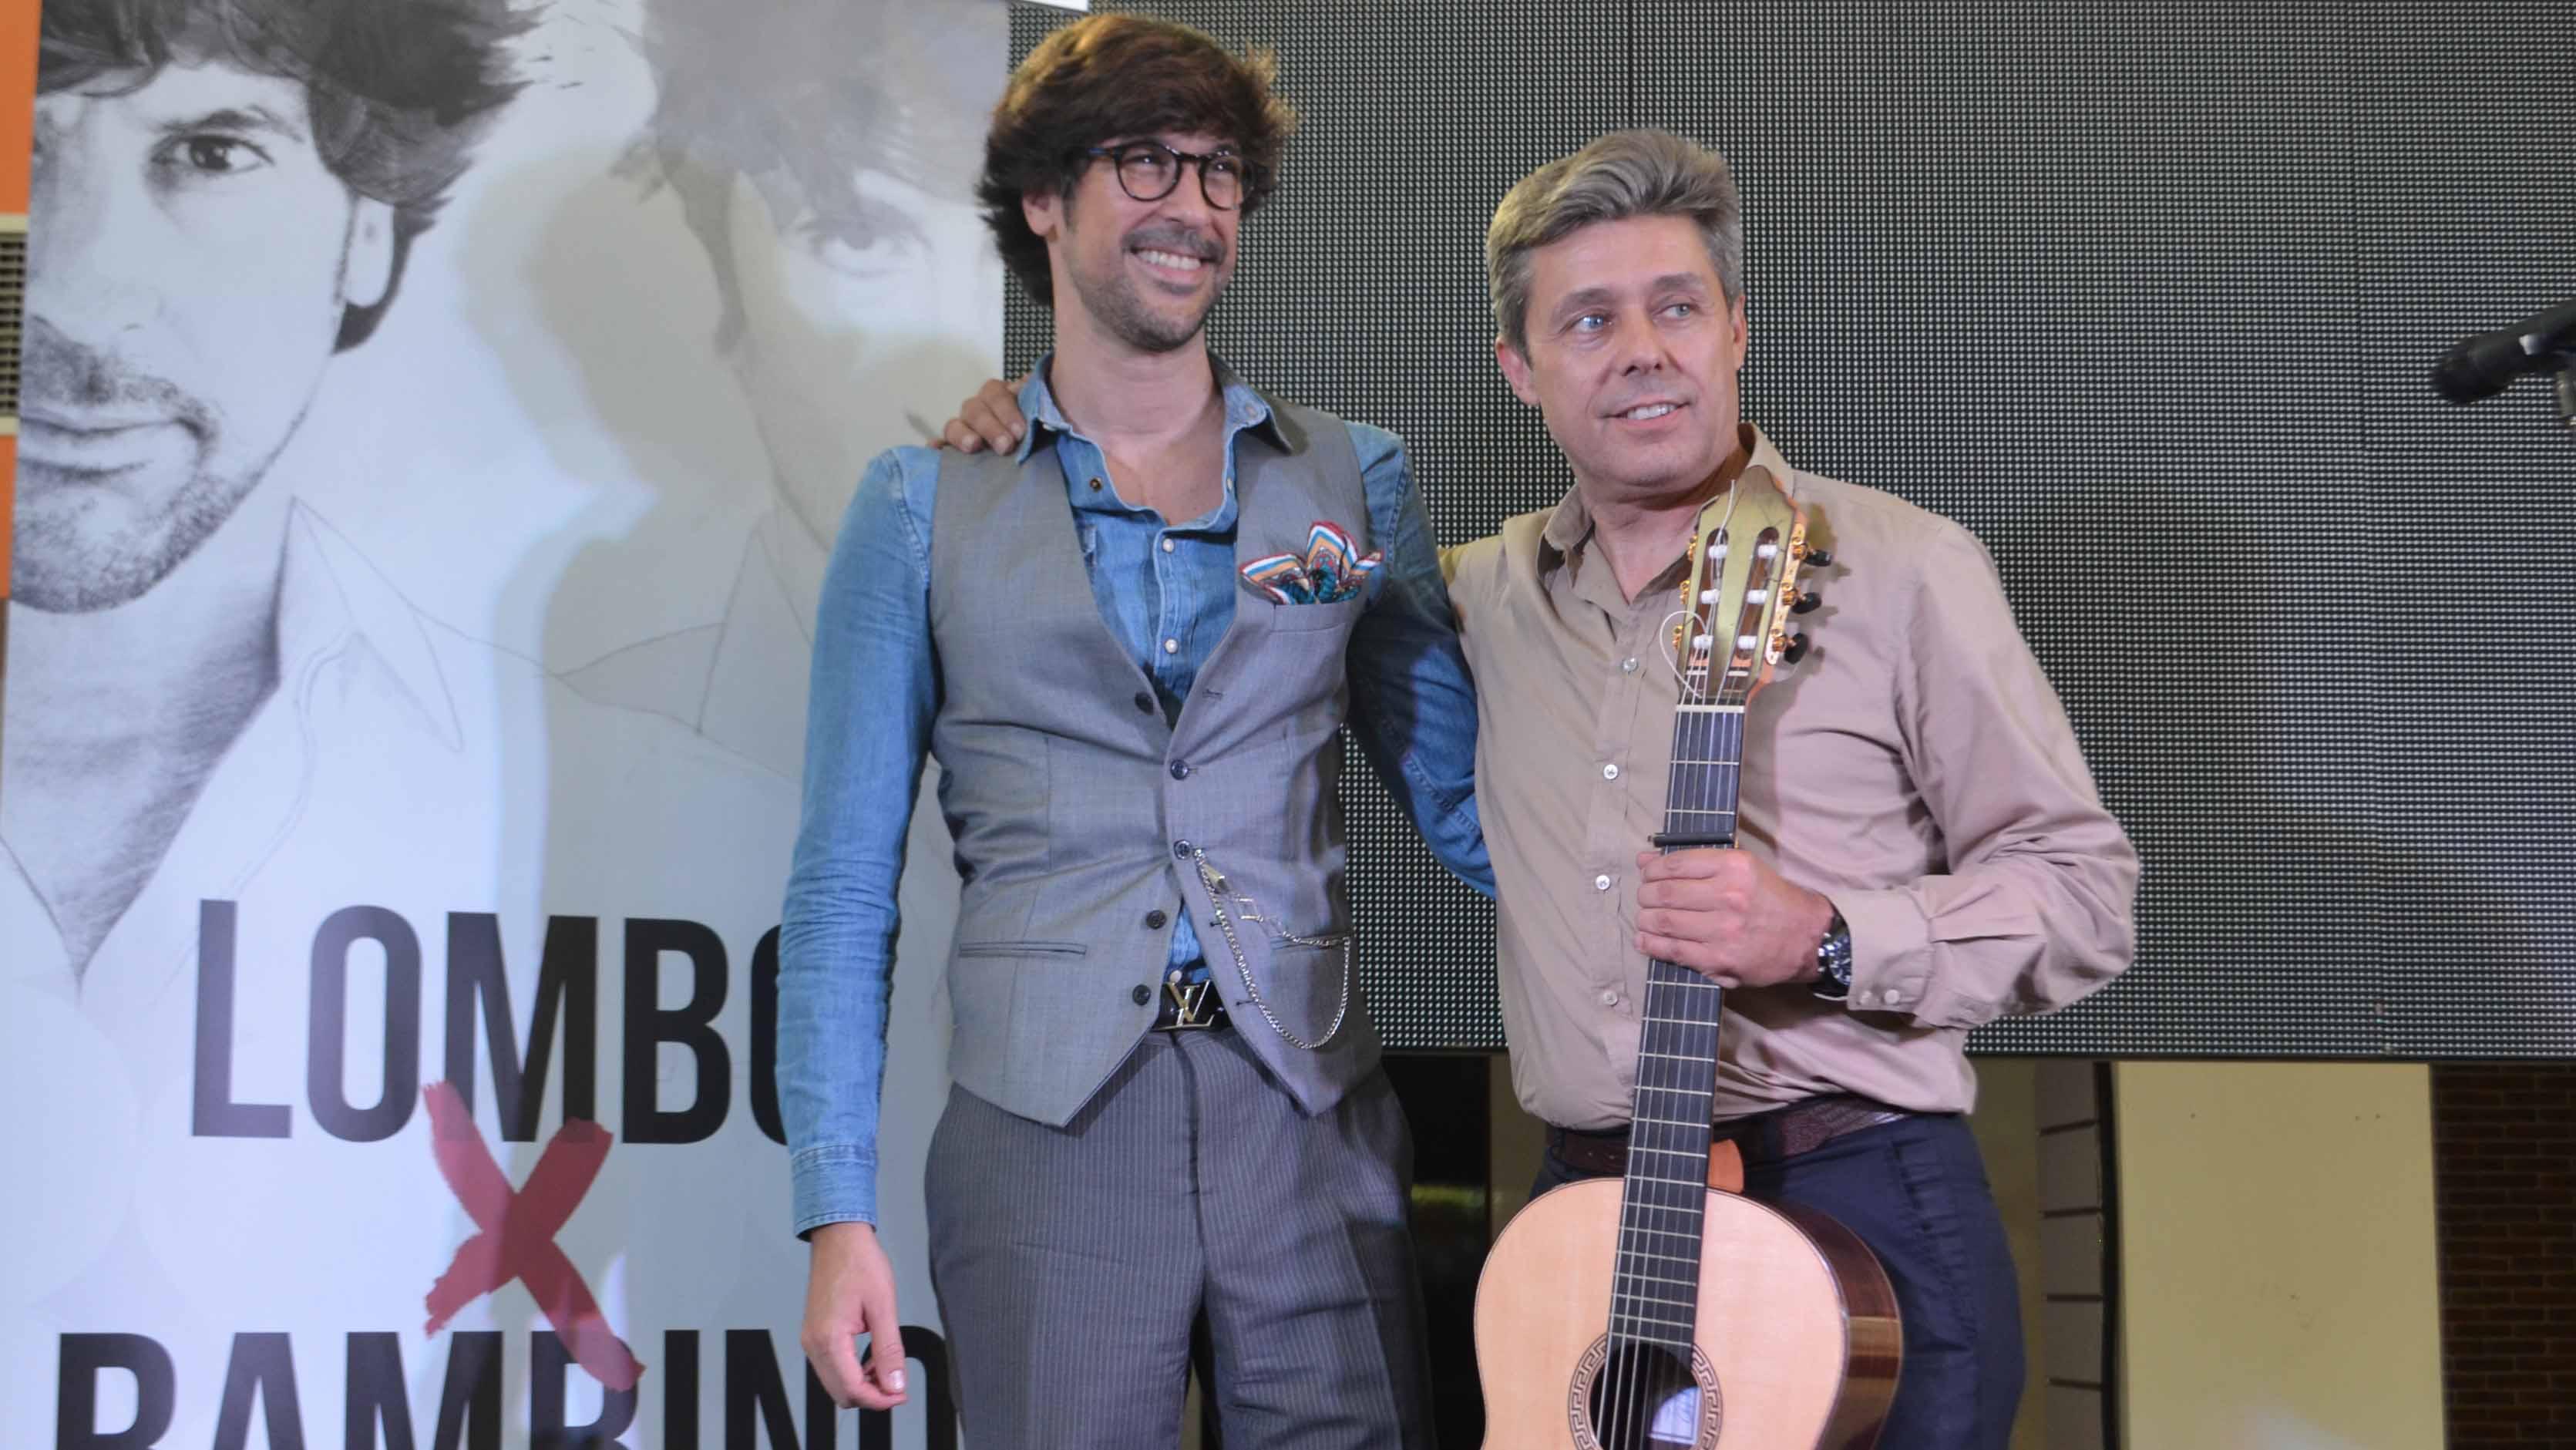 Manuel Lombo junto al guitarrista y productor Pedro Sierra